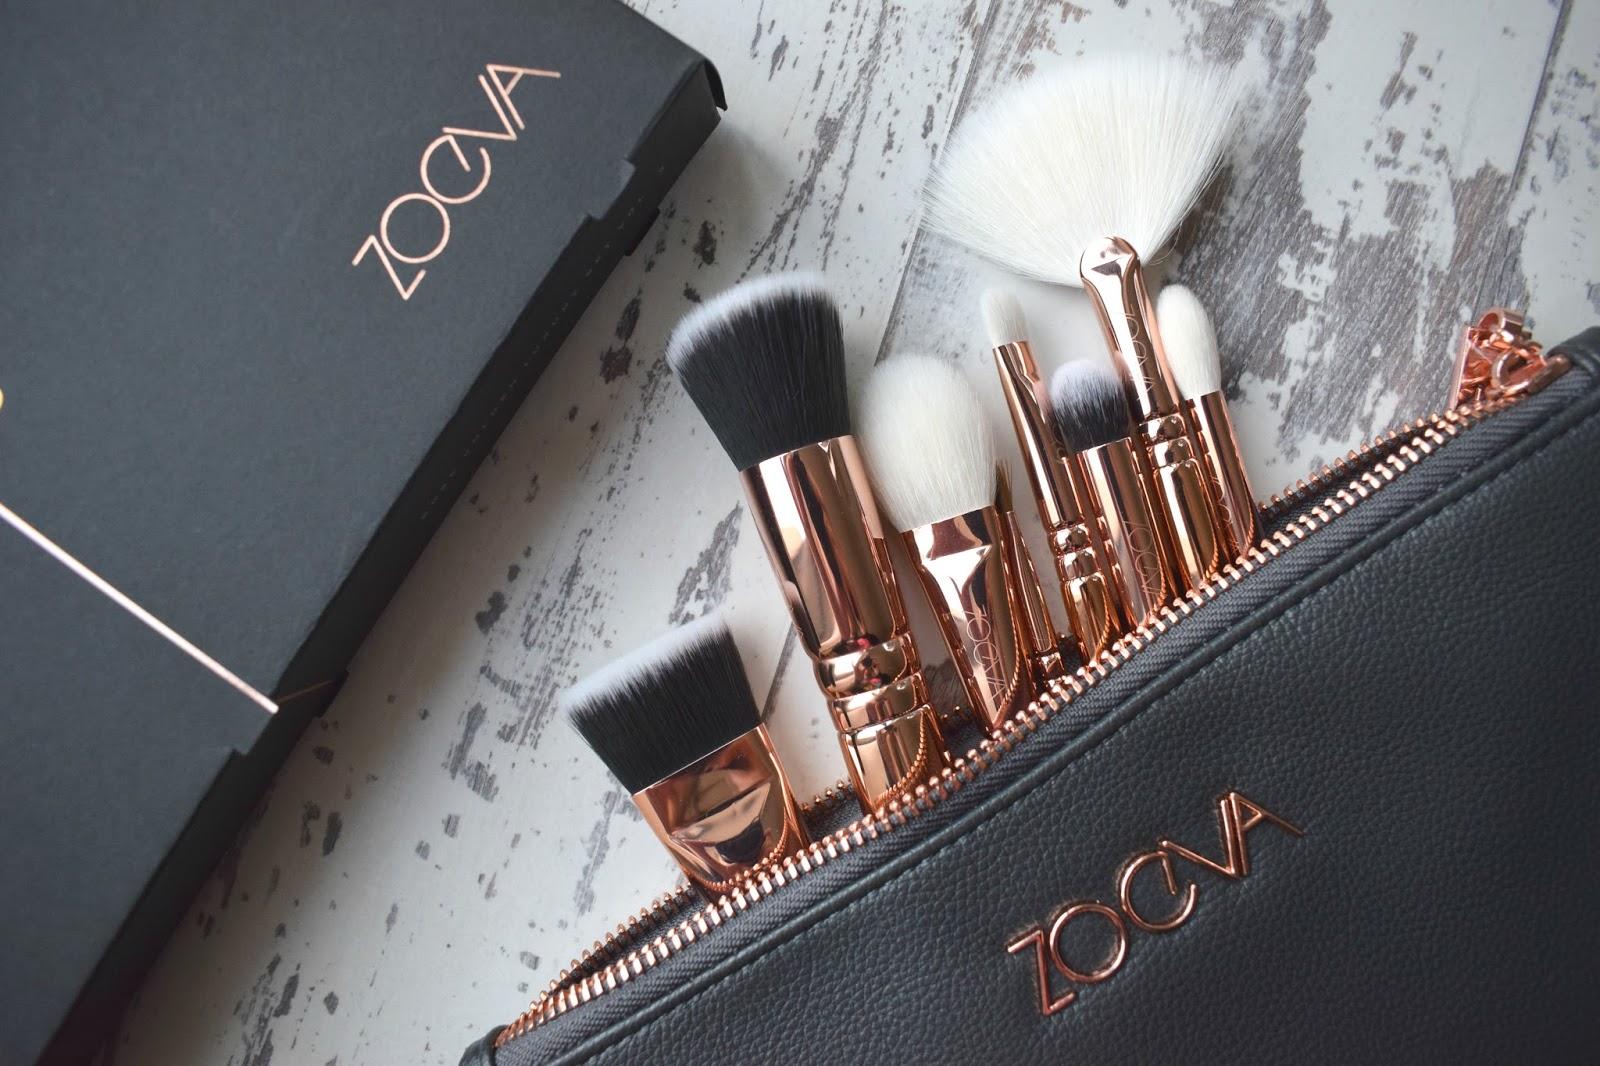 Zoeva Rose Golden Volume Vol 3 Brush Set Collection, Zoeva Rose Gold Vol. 3 Review, Beauty Blog